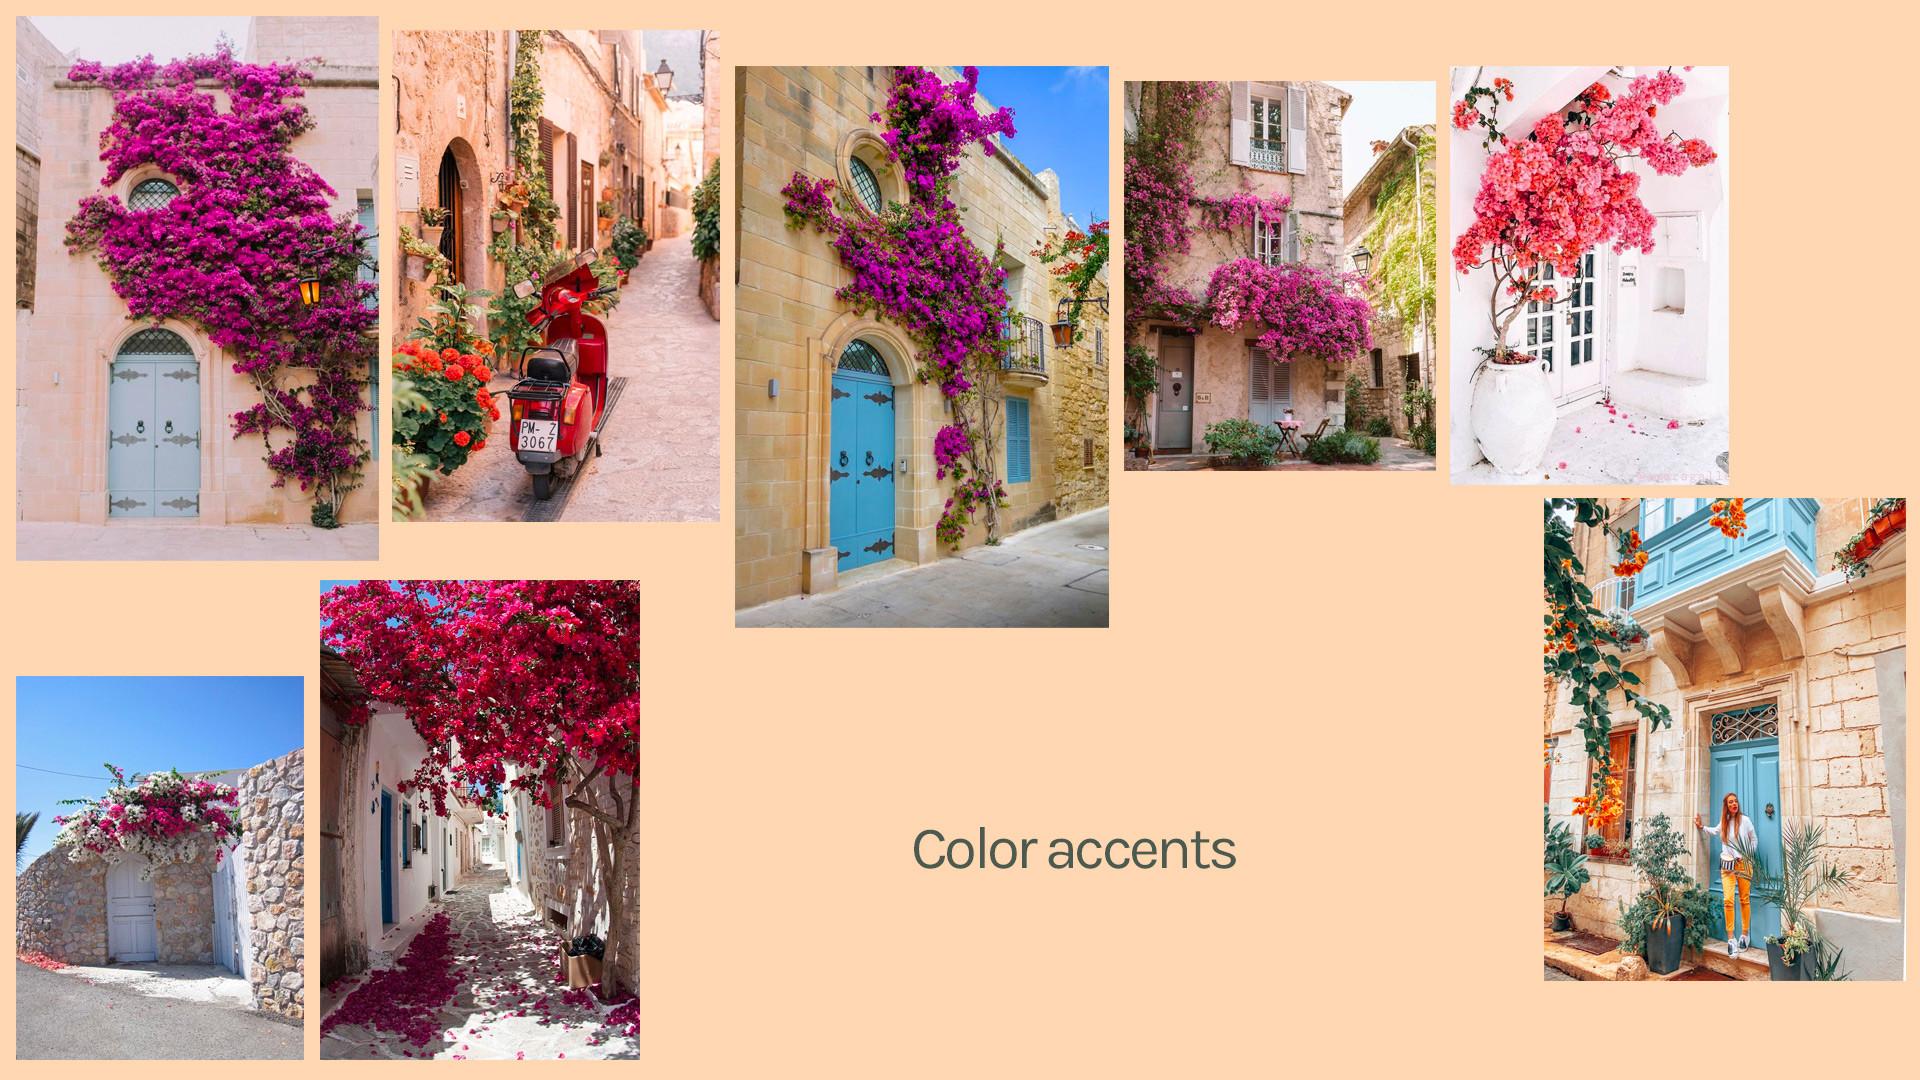 color-accents.jpg.e2de29fa80287950bde3e1994c245f77.jpg